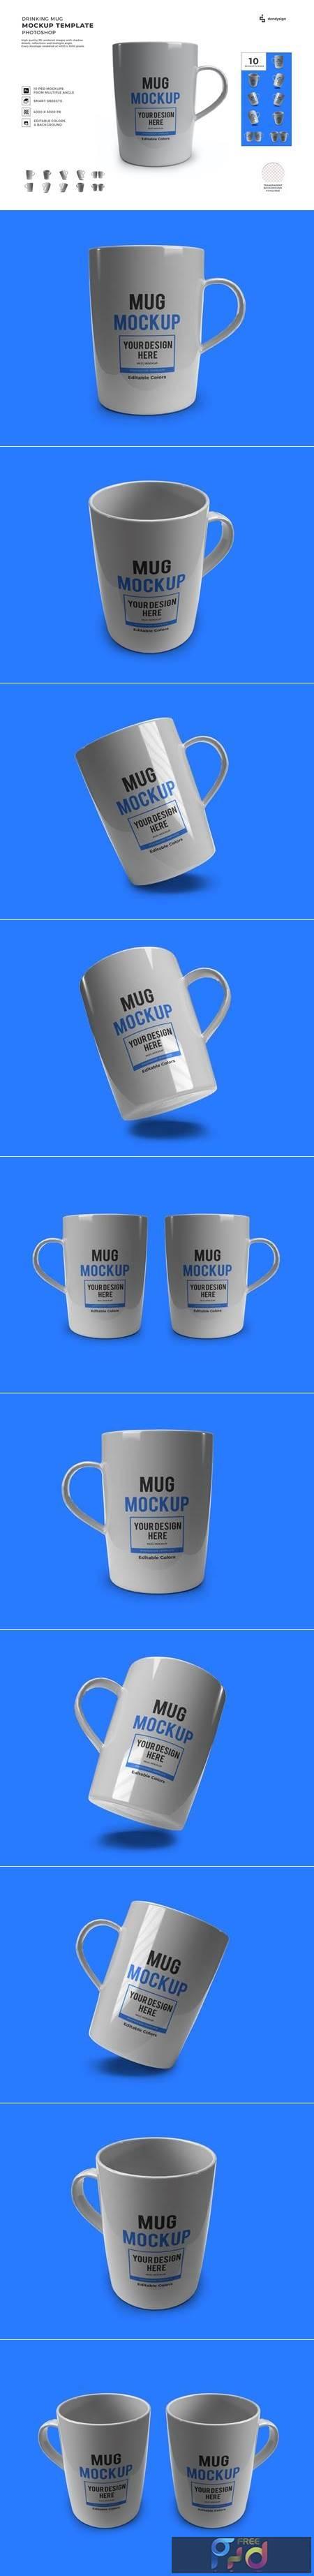 Coffee Mug Mockup Template Set KW3AXTH 1